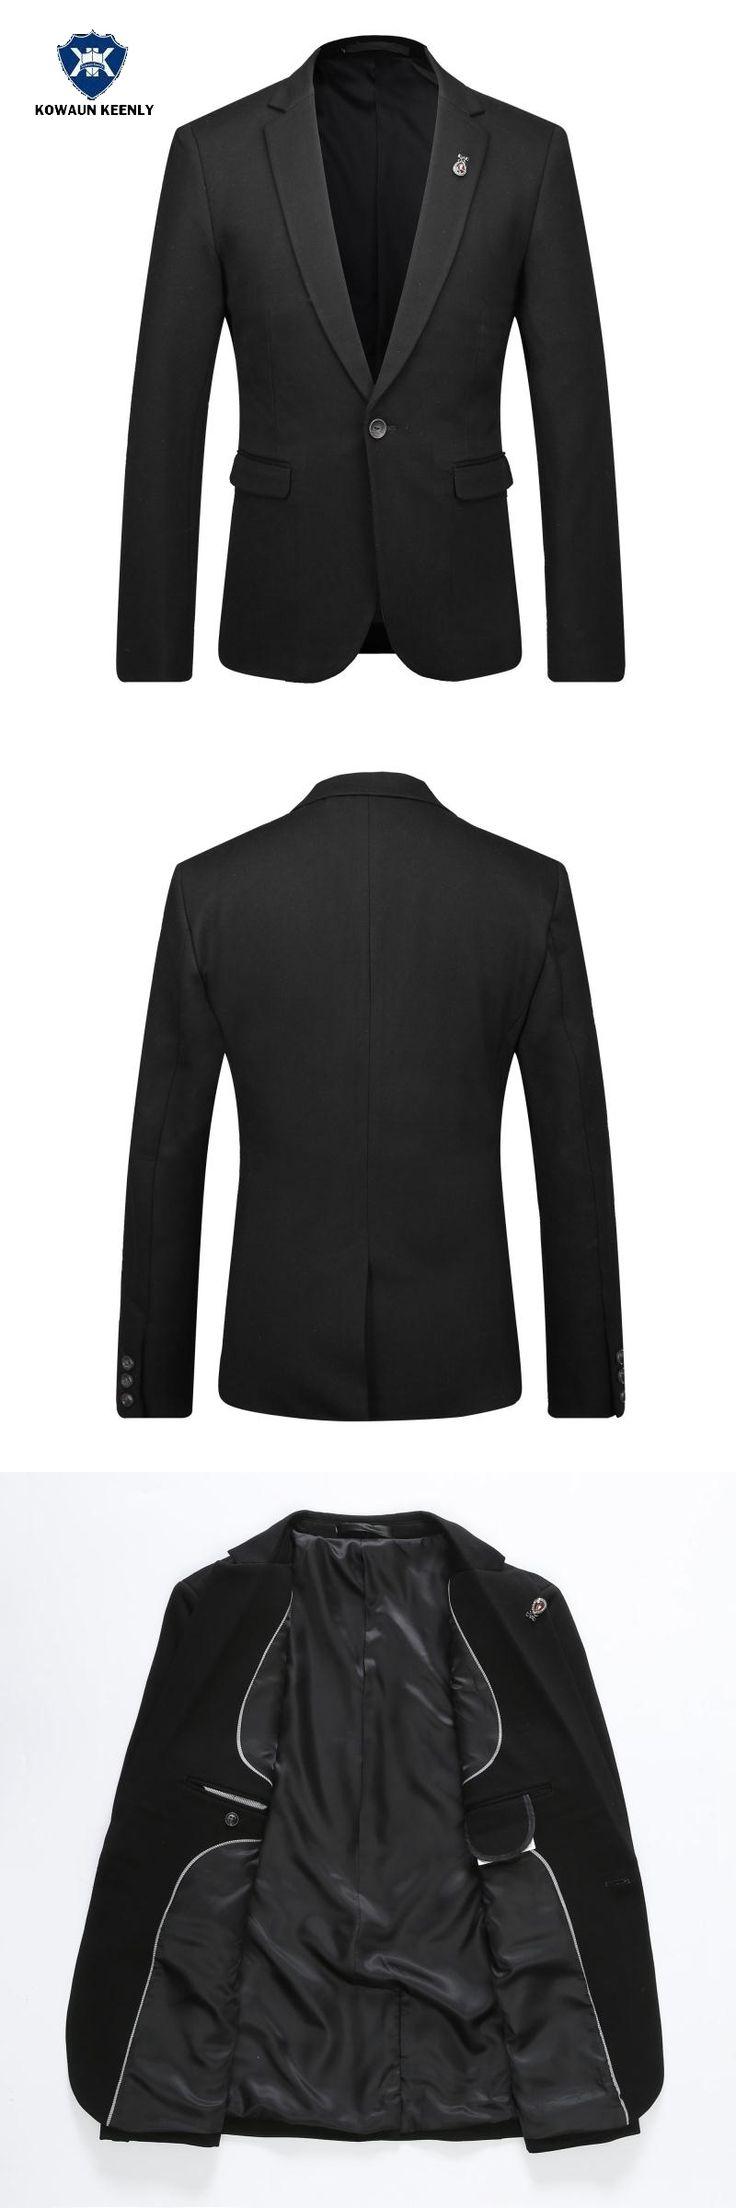 2017 Stylish Men Slim Fit Solid  Black Suit Jacket Luxury Casual Blazer Wedding Dress Party Suit Business Dress Men Clothing